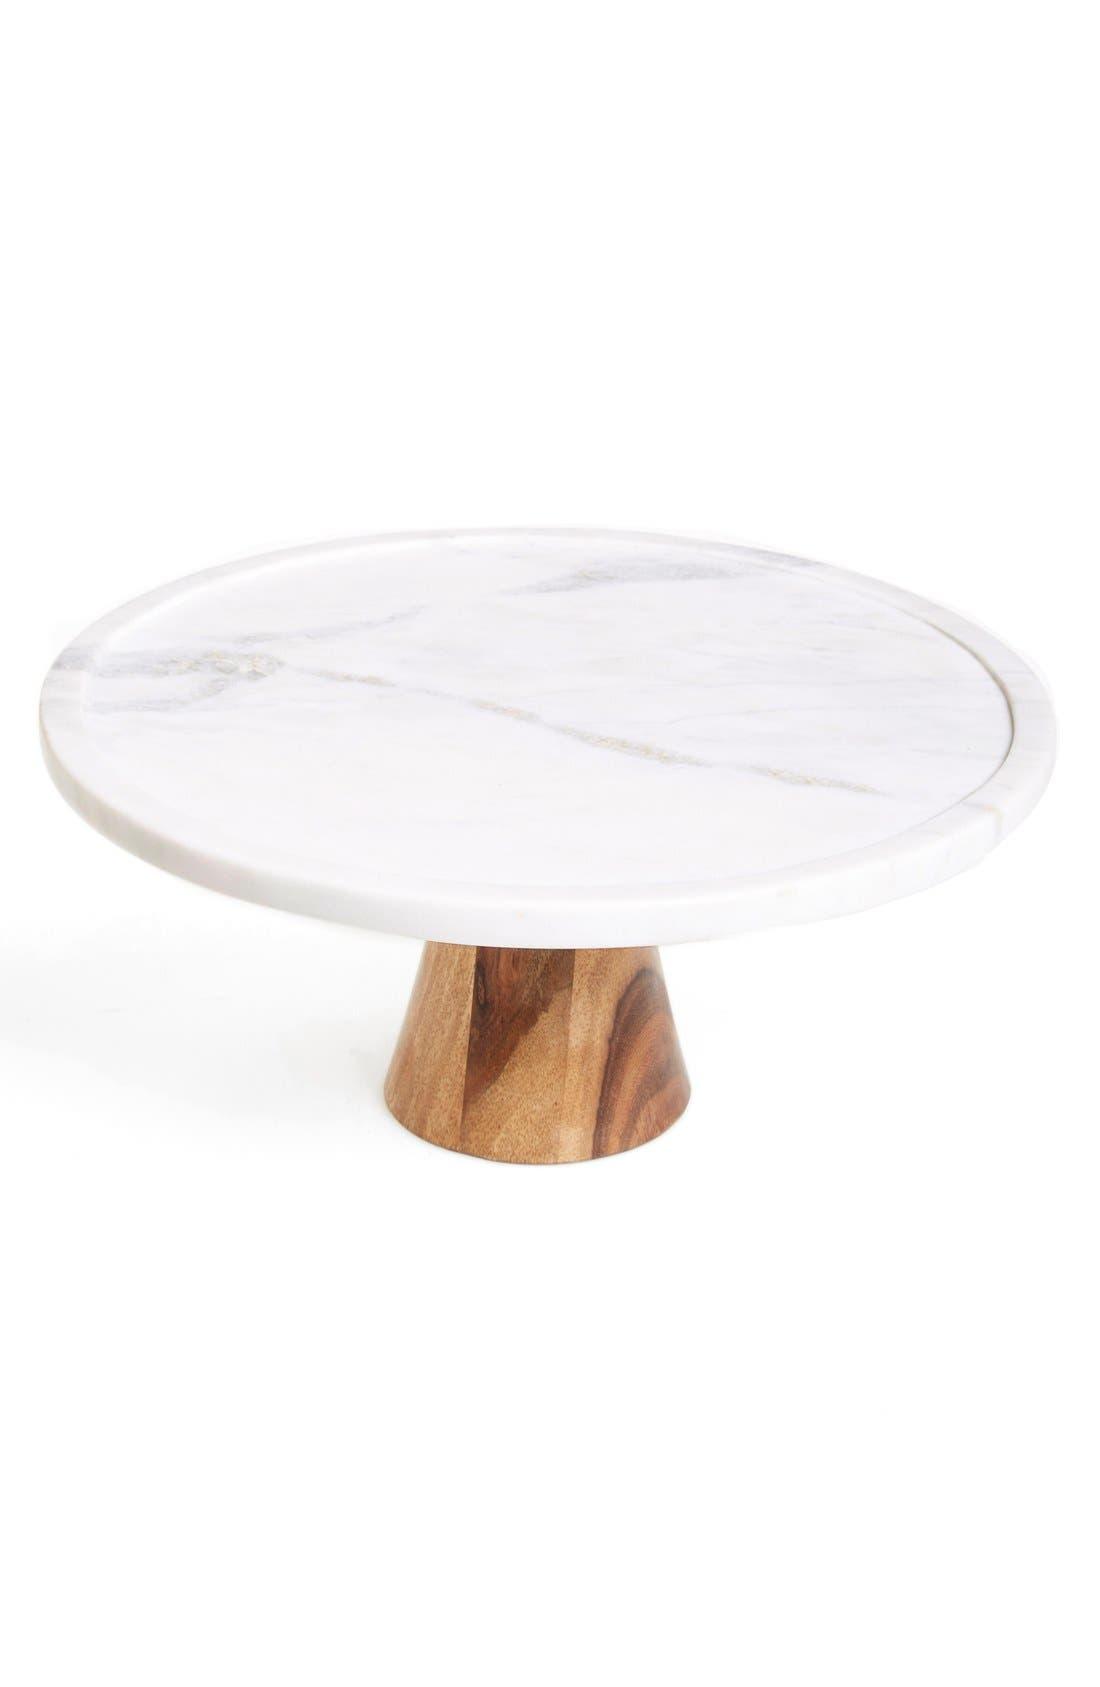 Main Image - Thirstystone Marble & Wood Cake Stand